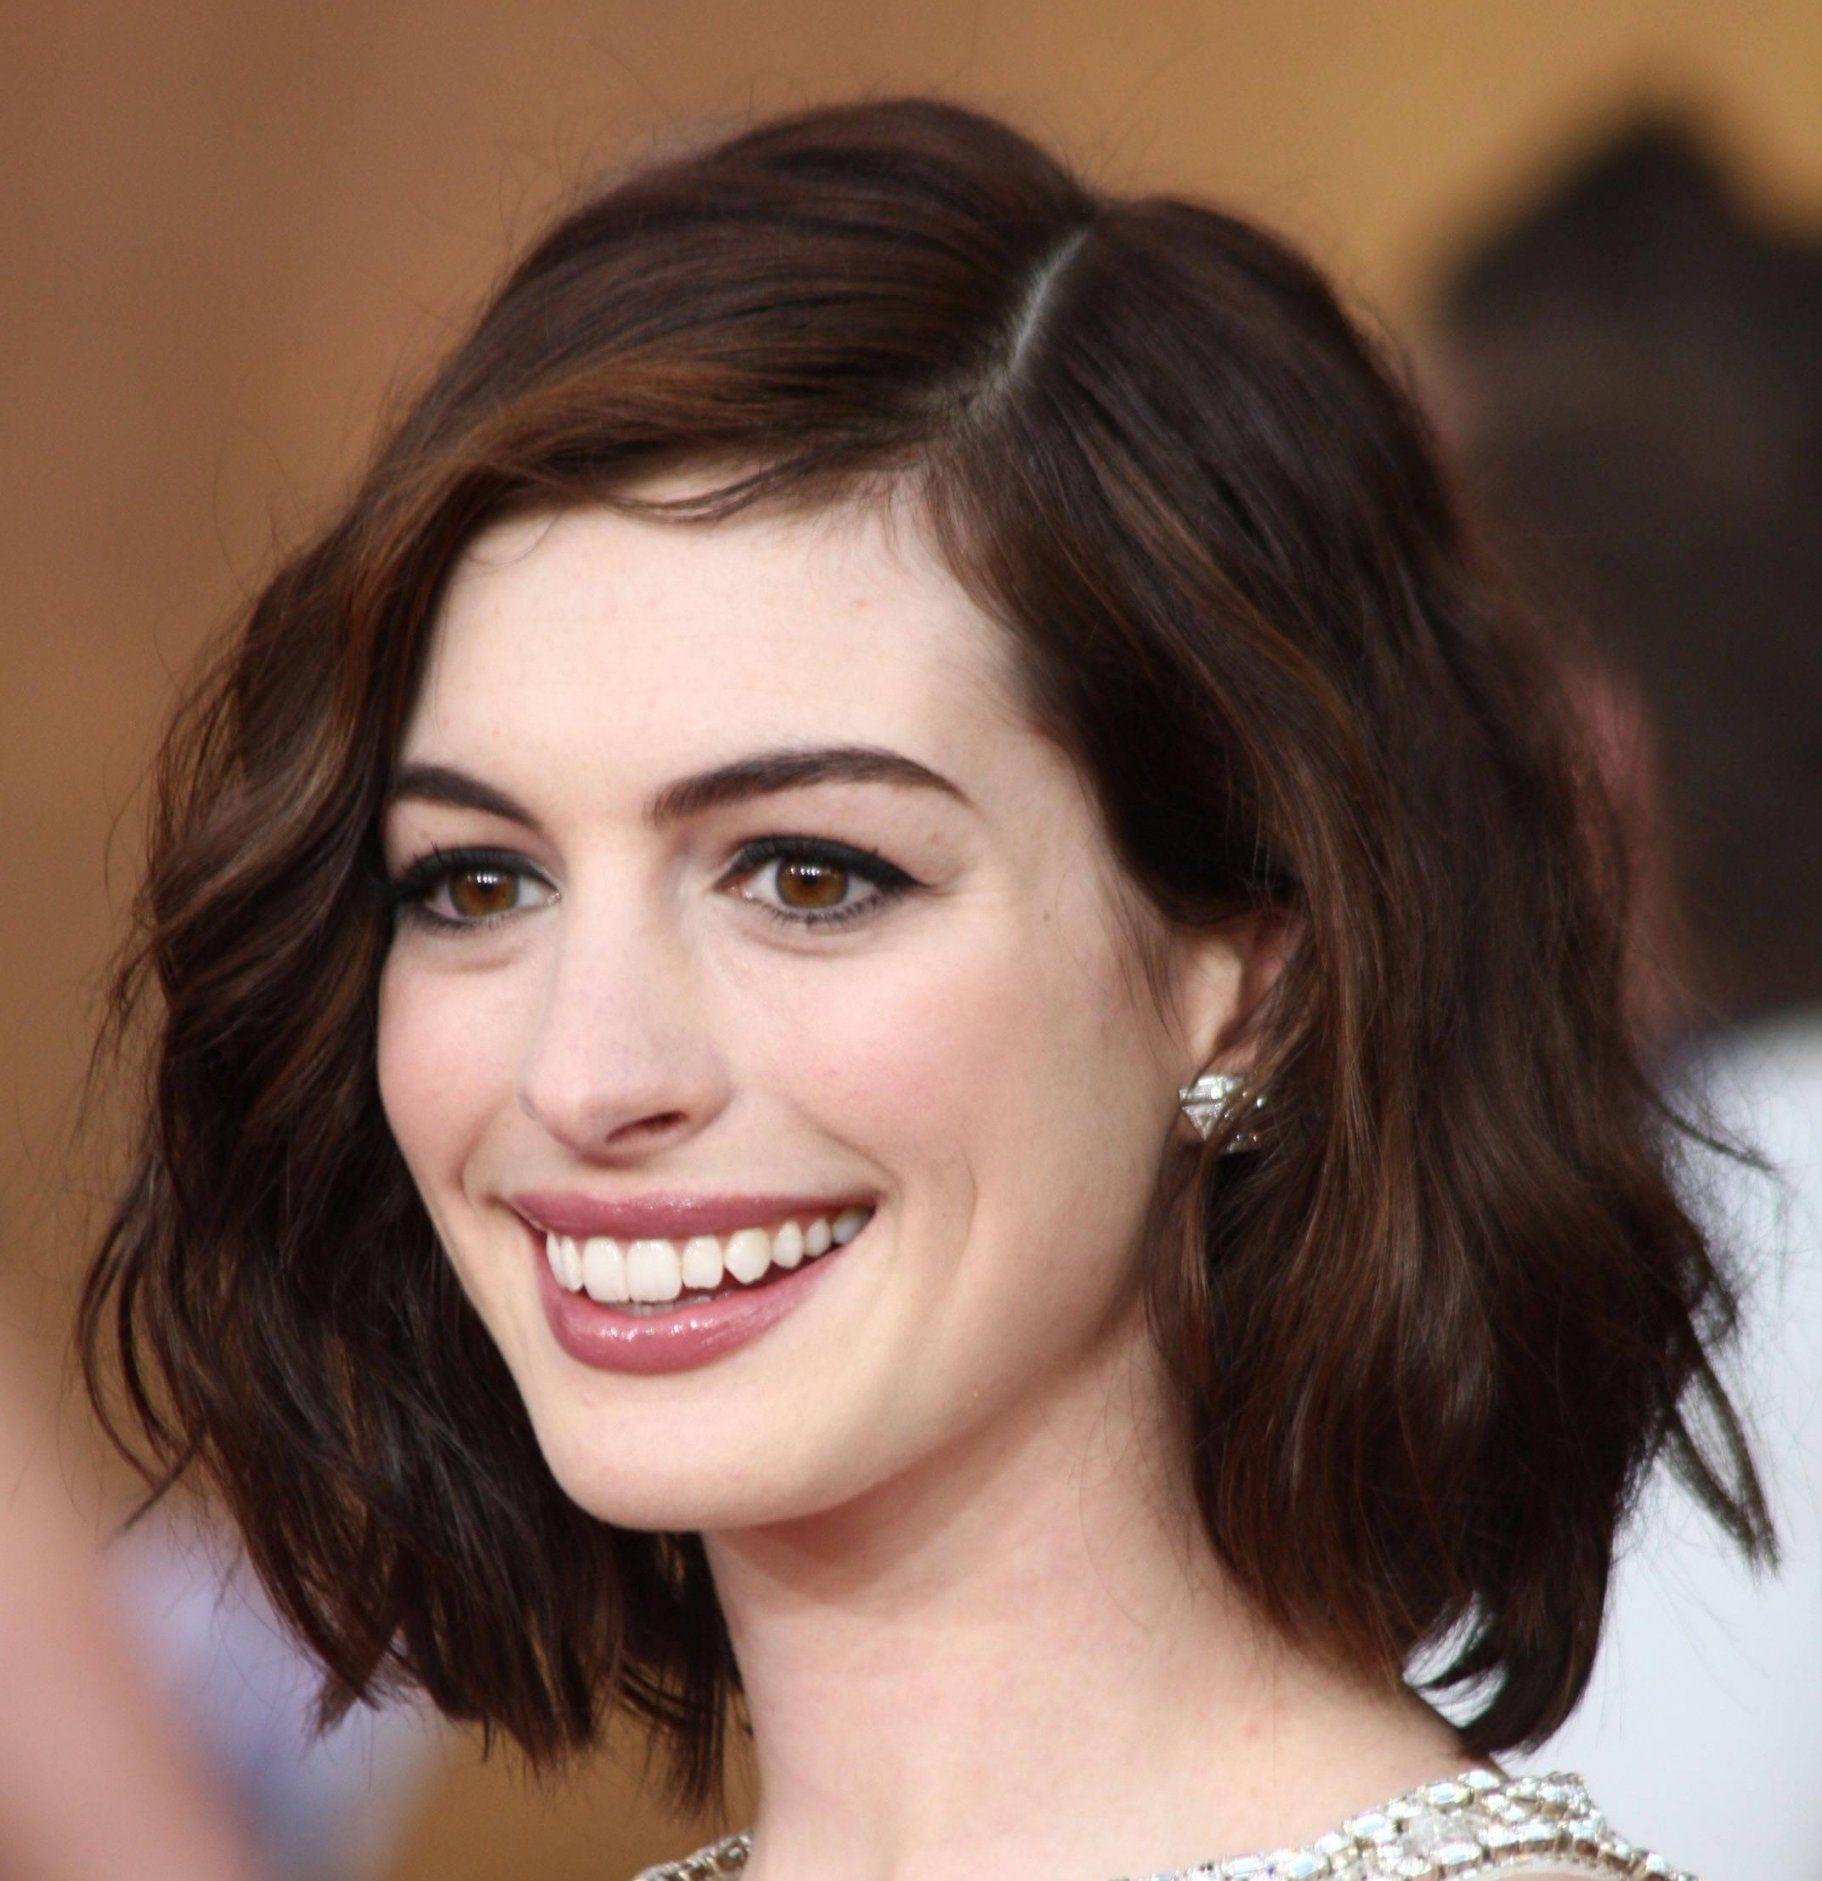 Image Result For Cute Shoulder Length Hairstyles Haircut For Thick Hair Thick Hair Styles Neck Length Hair